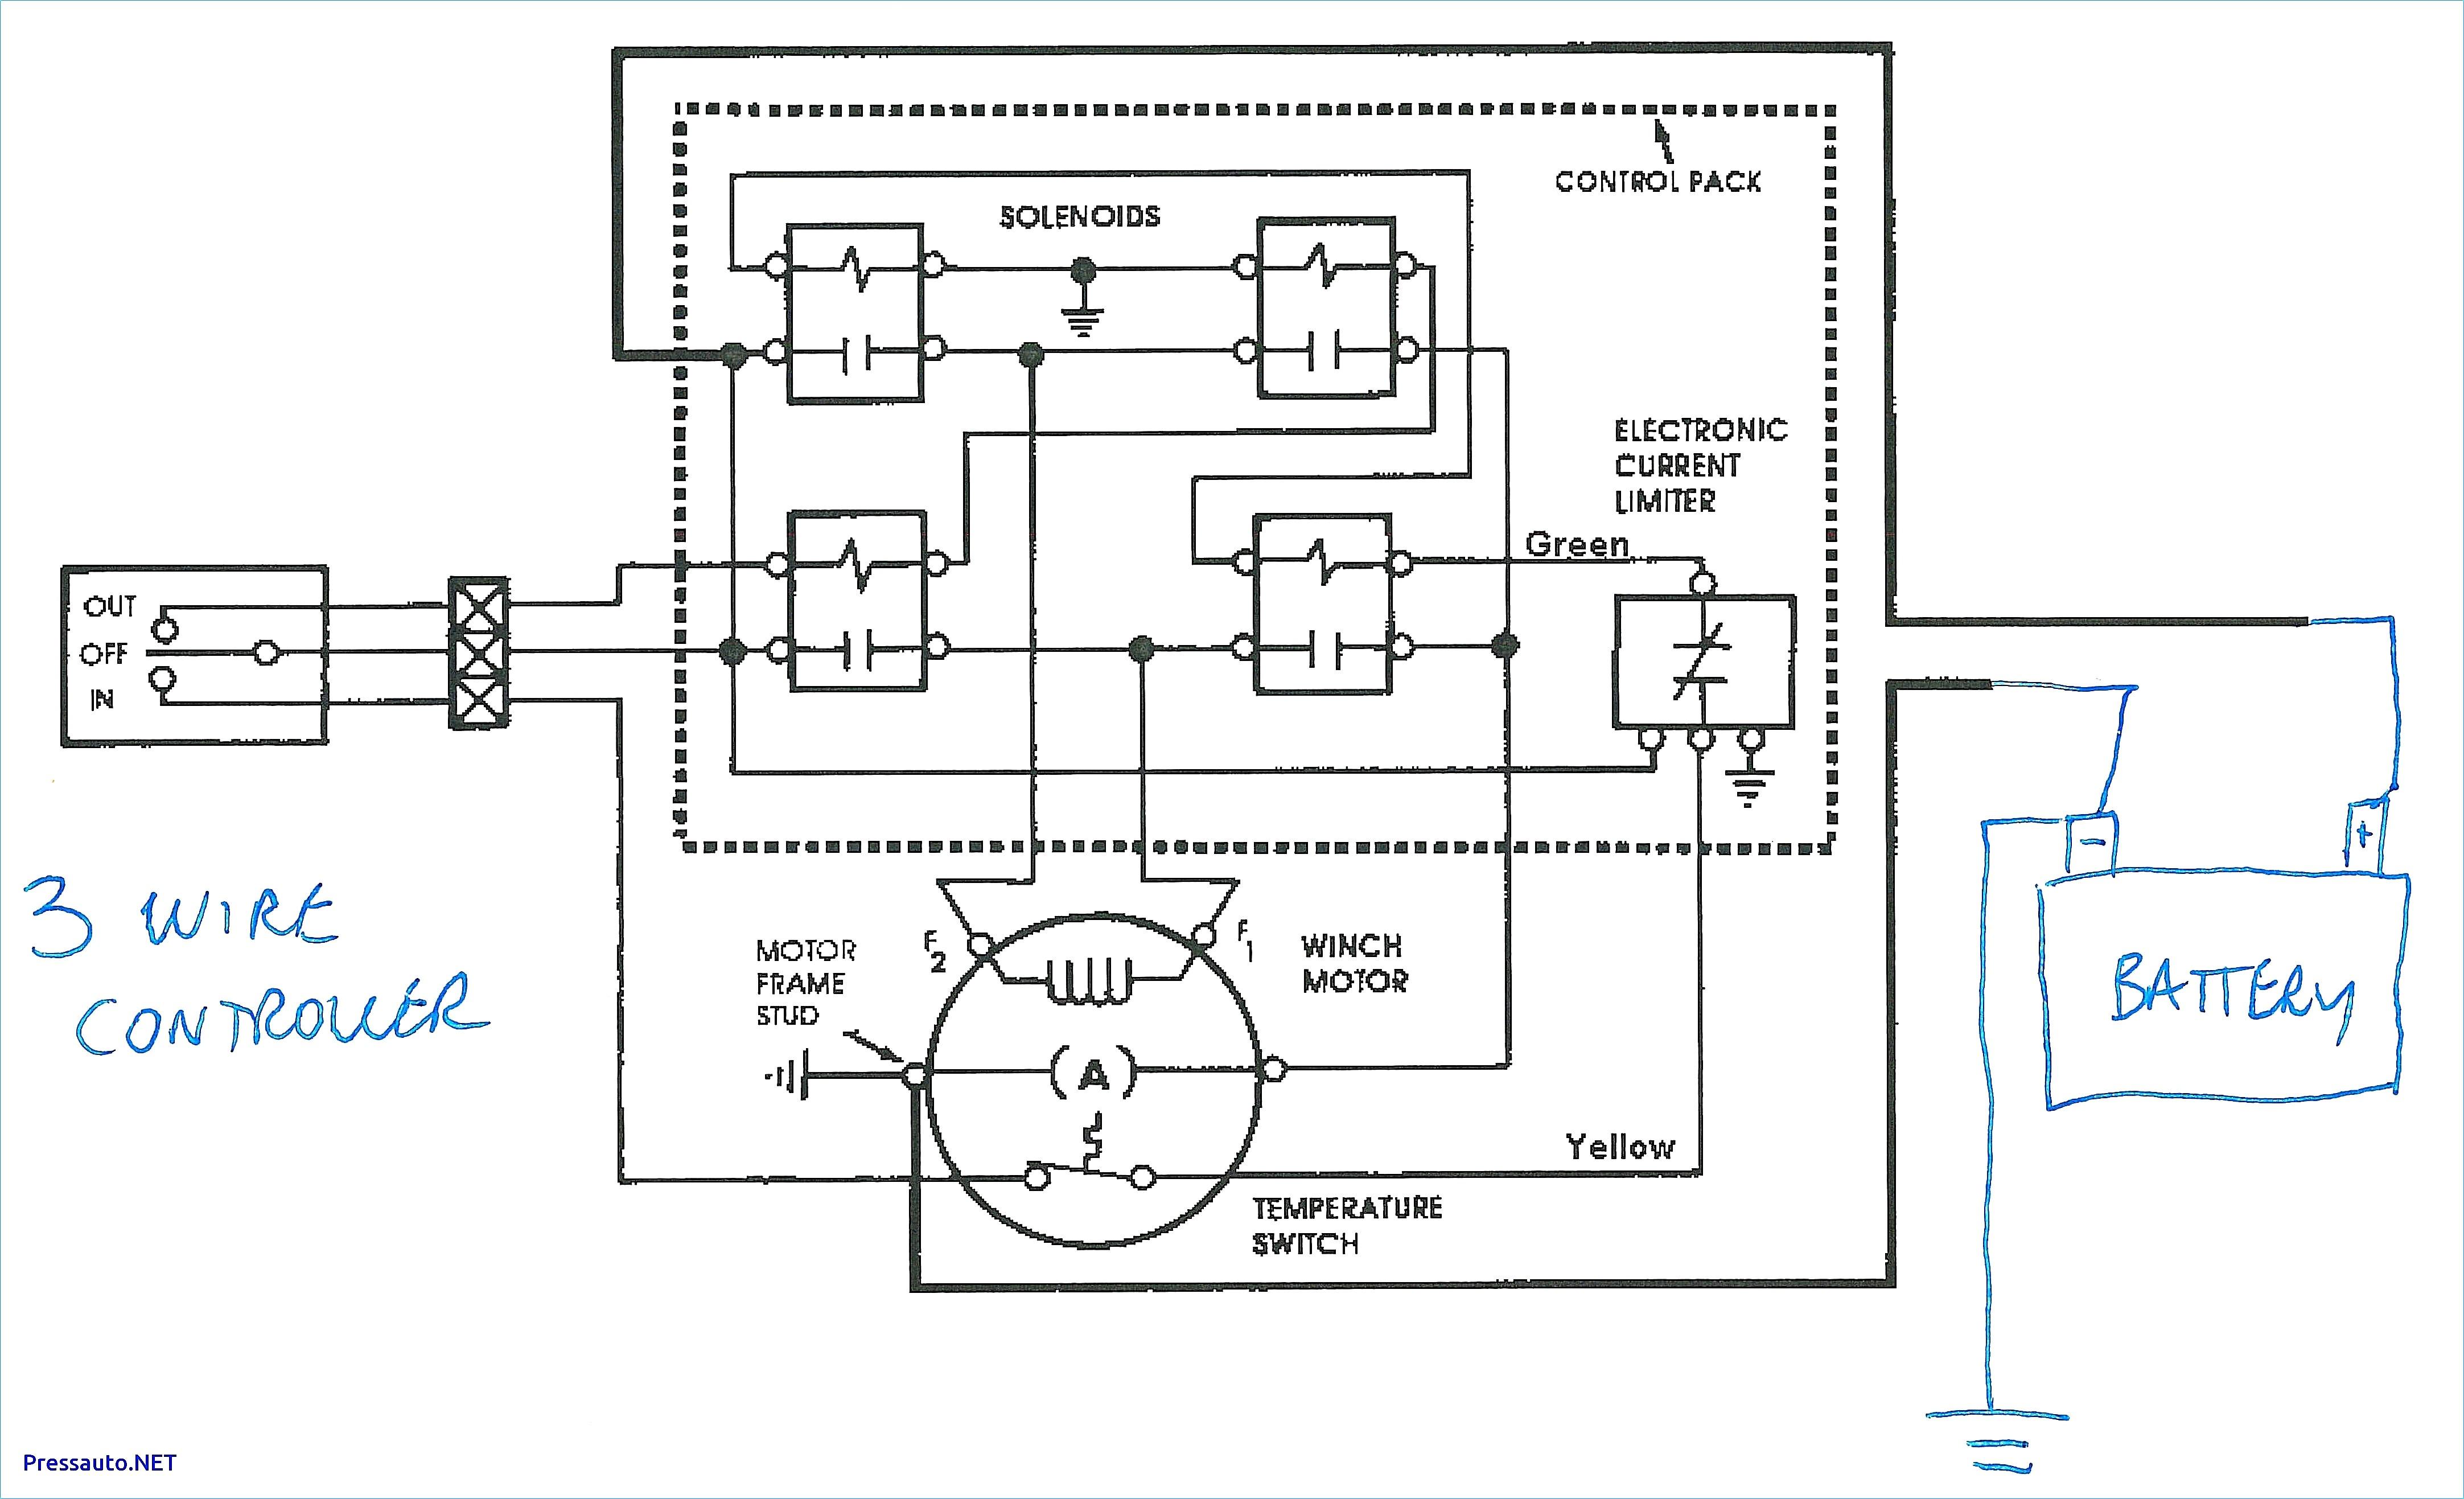 Winch Relay Wiring Diagram - Warn Winch Wiring Diagram Solenoid